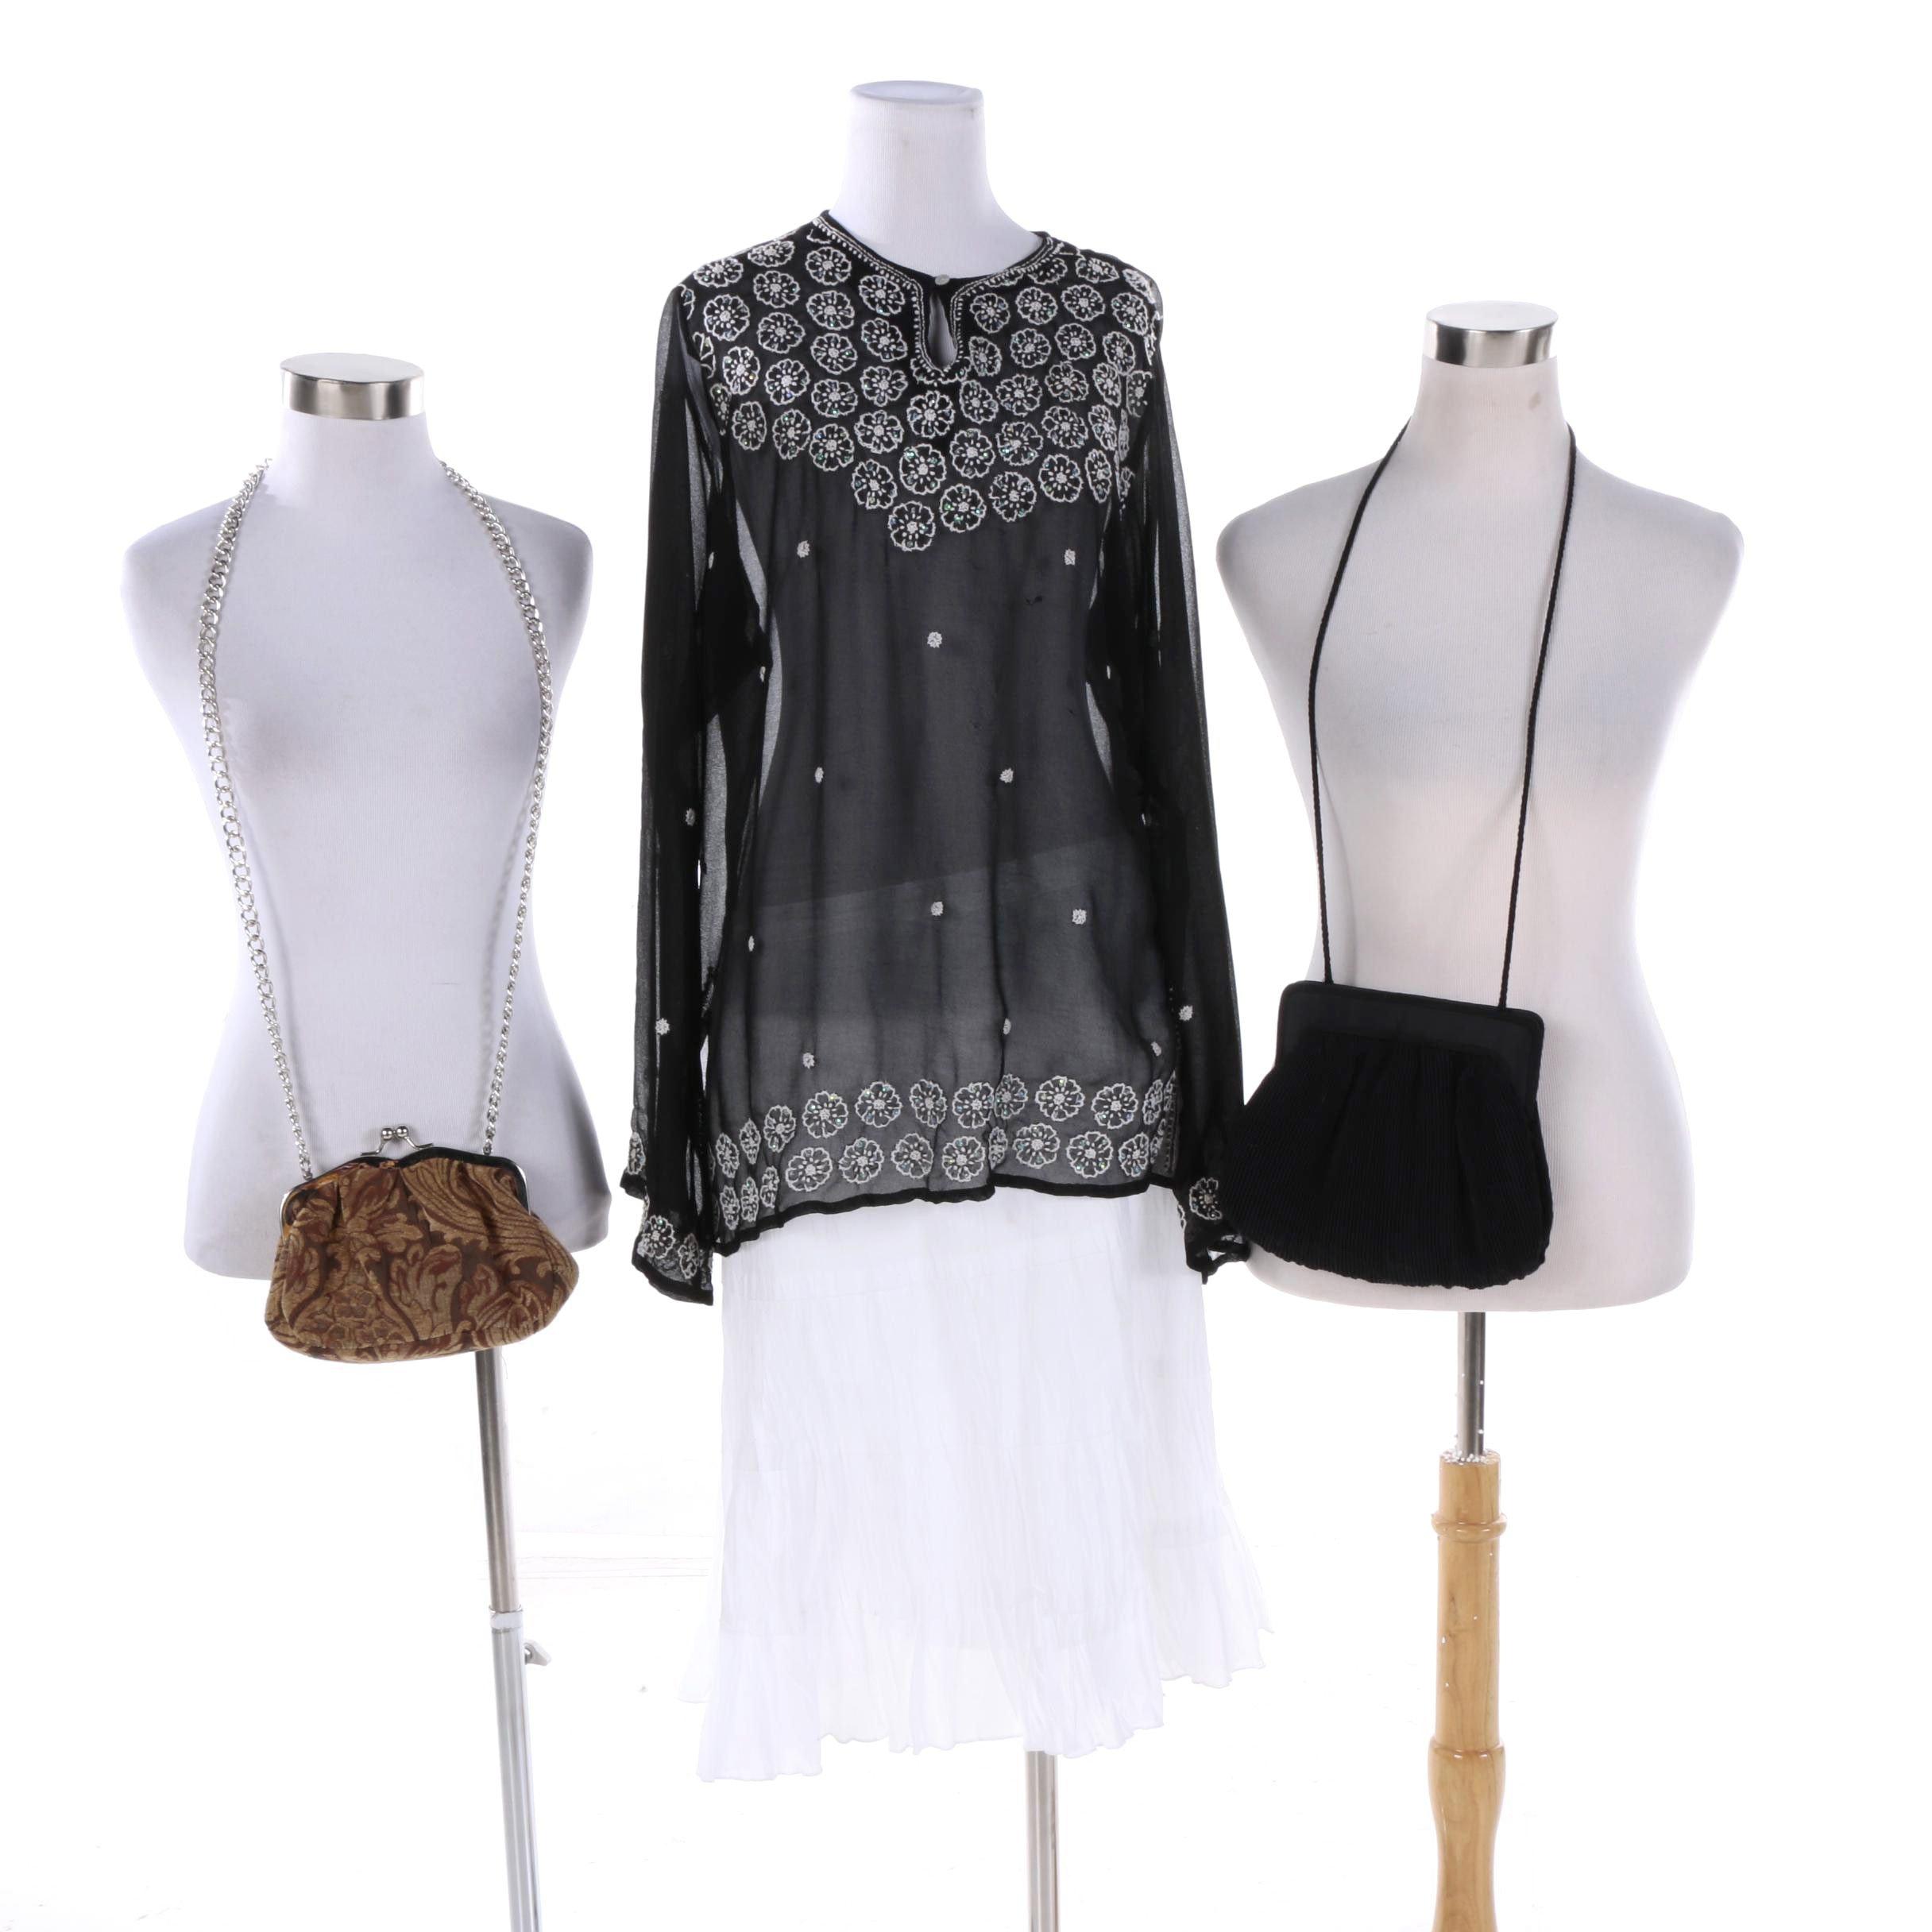 Women's Clothing and Handbags Including Cejon Beachwear and Apt 9